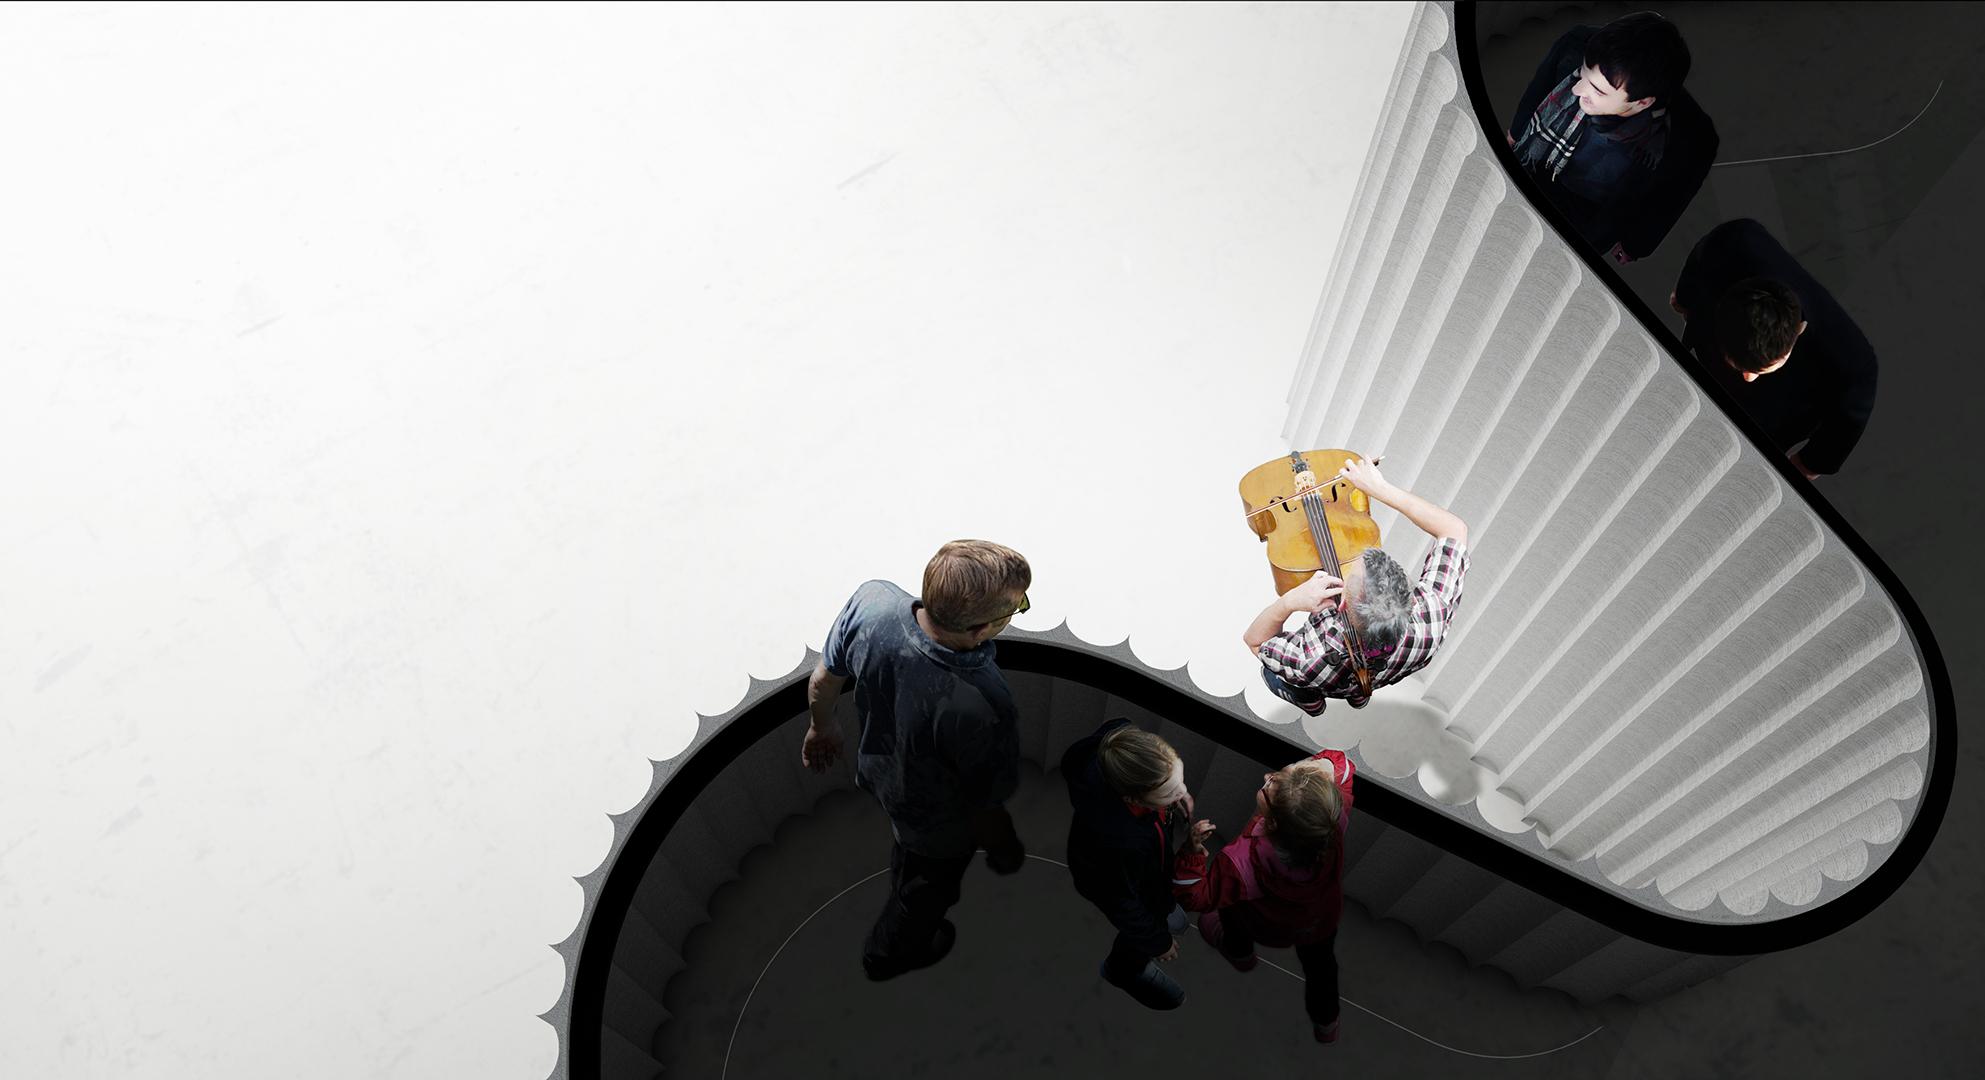 Rotunda_Image3_1920x1080.jpg